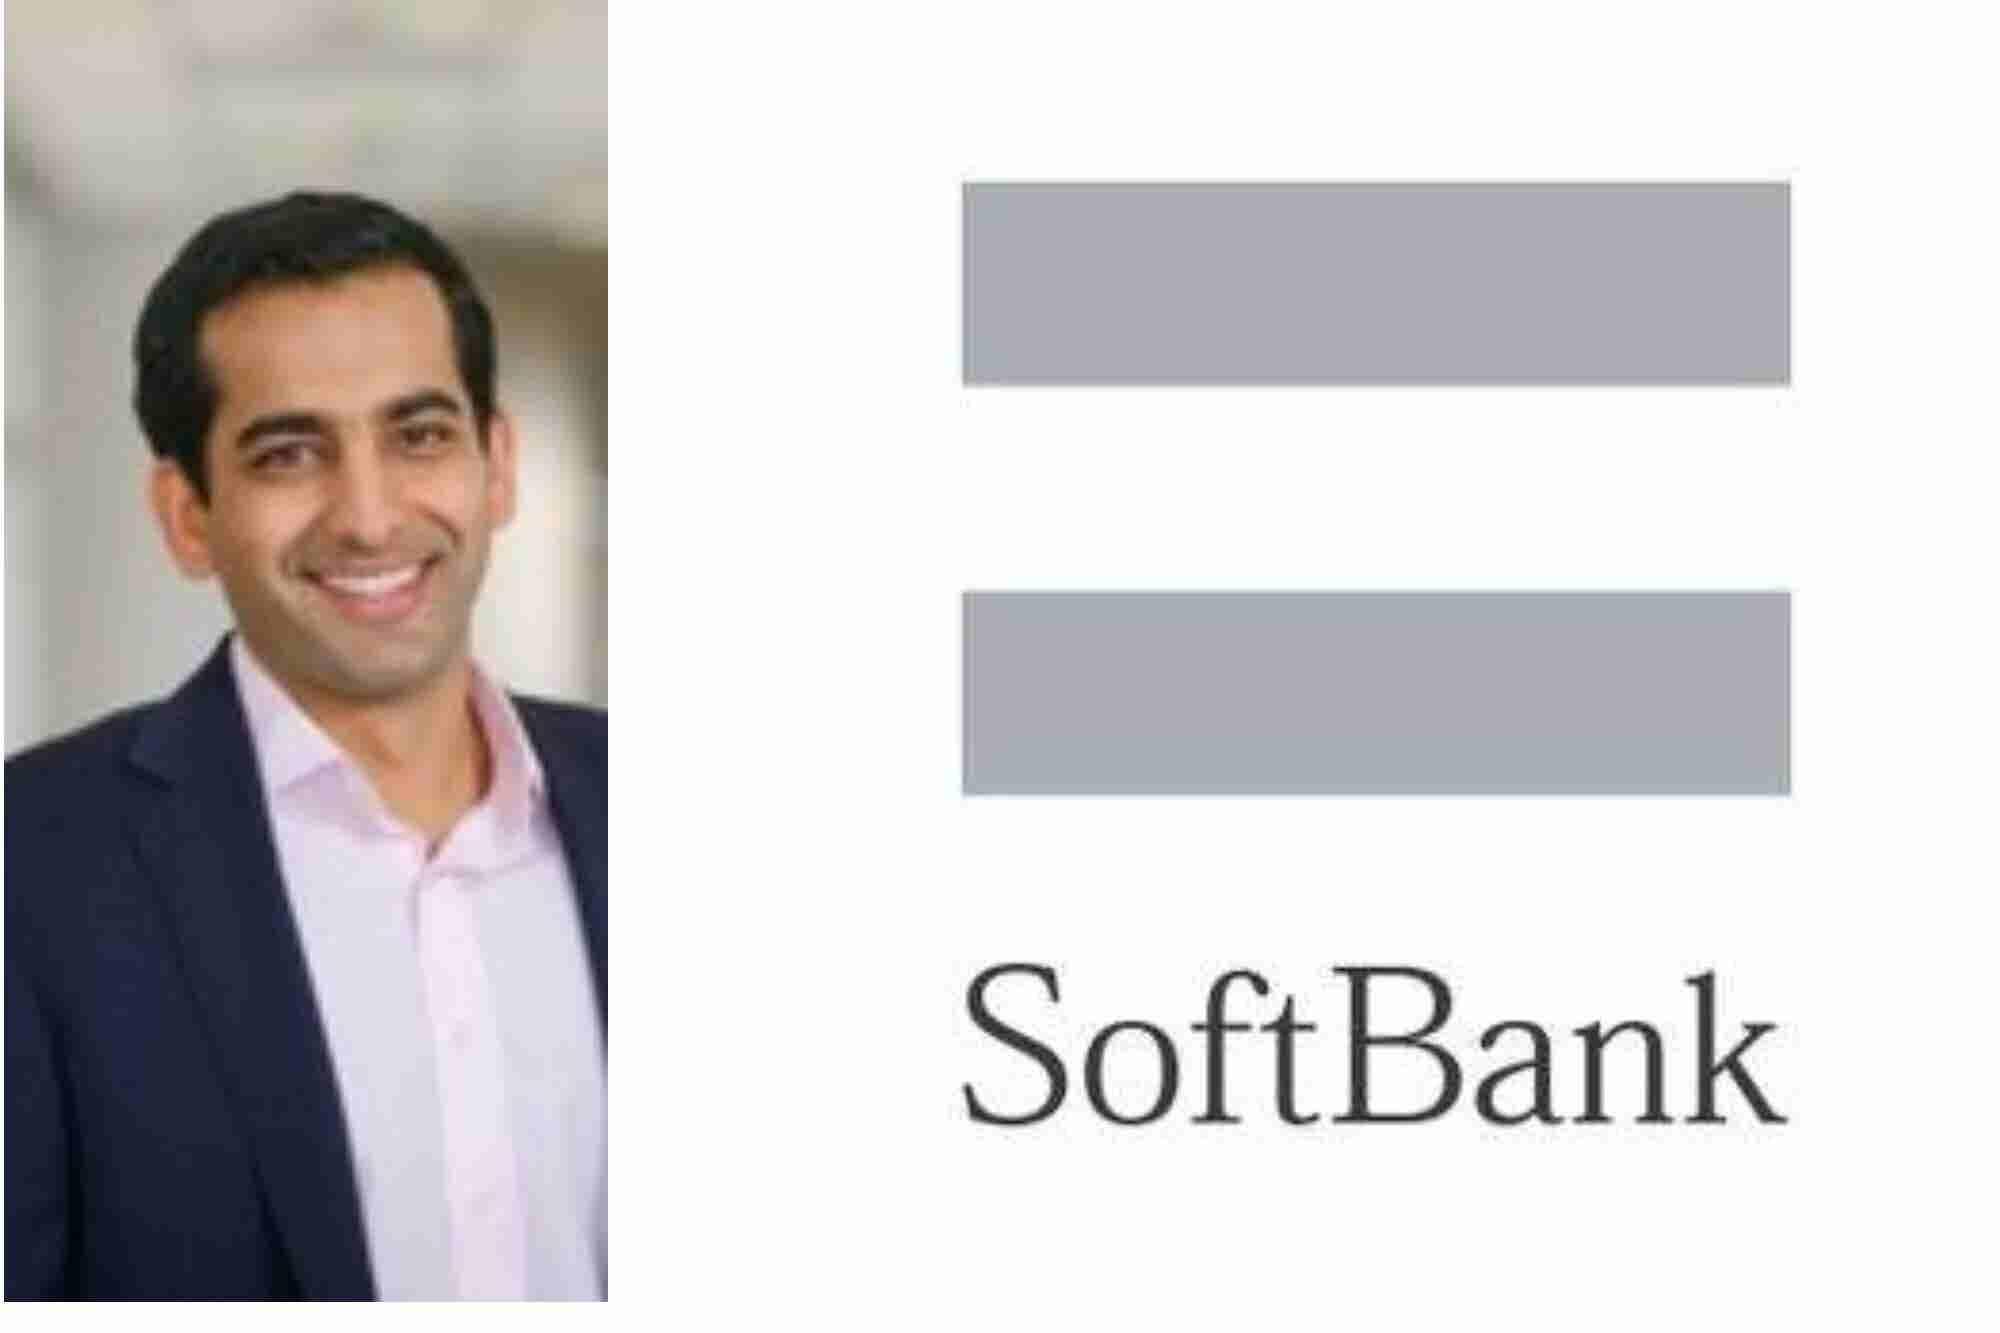 SoftBank Appoints Sumer Juneja as India Head